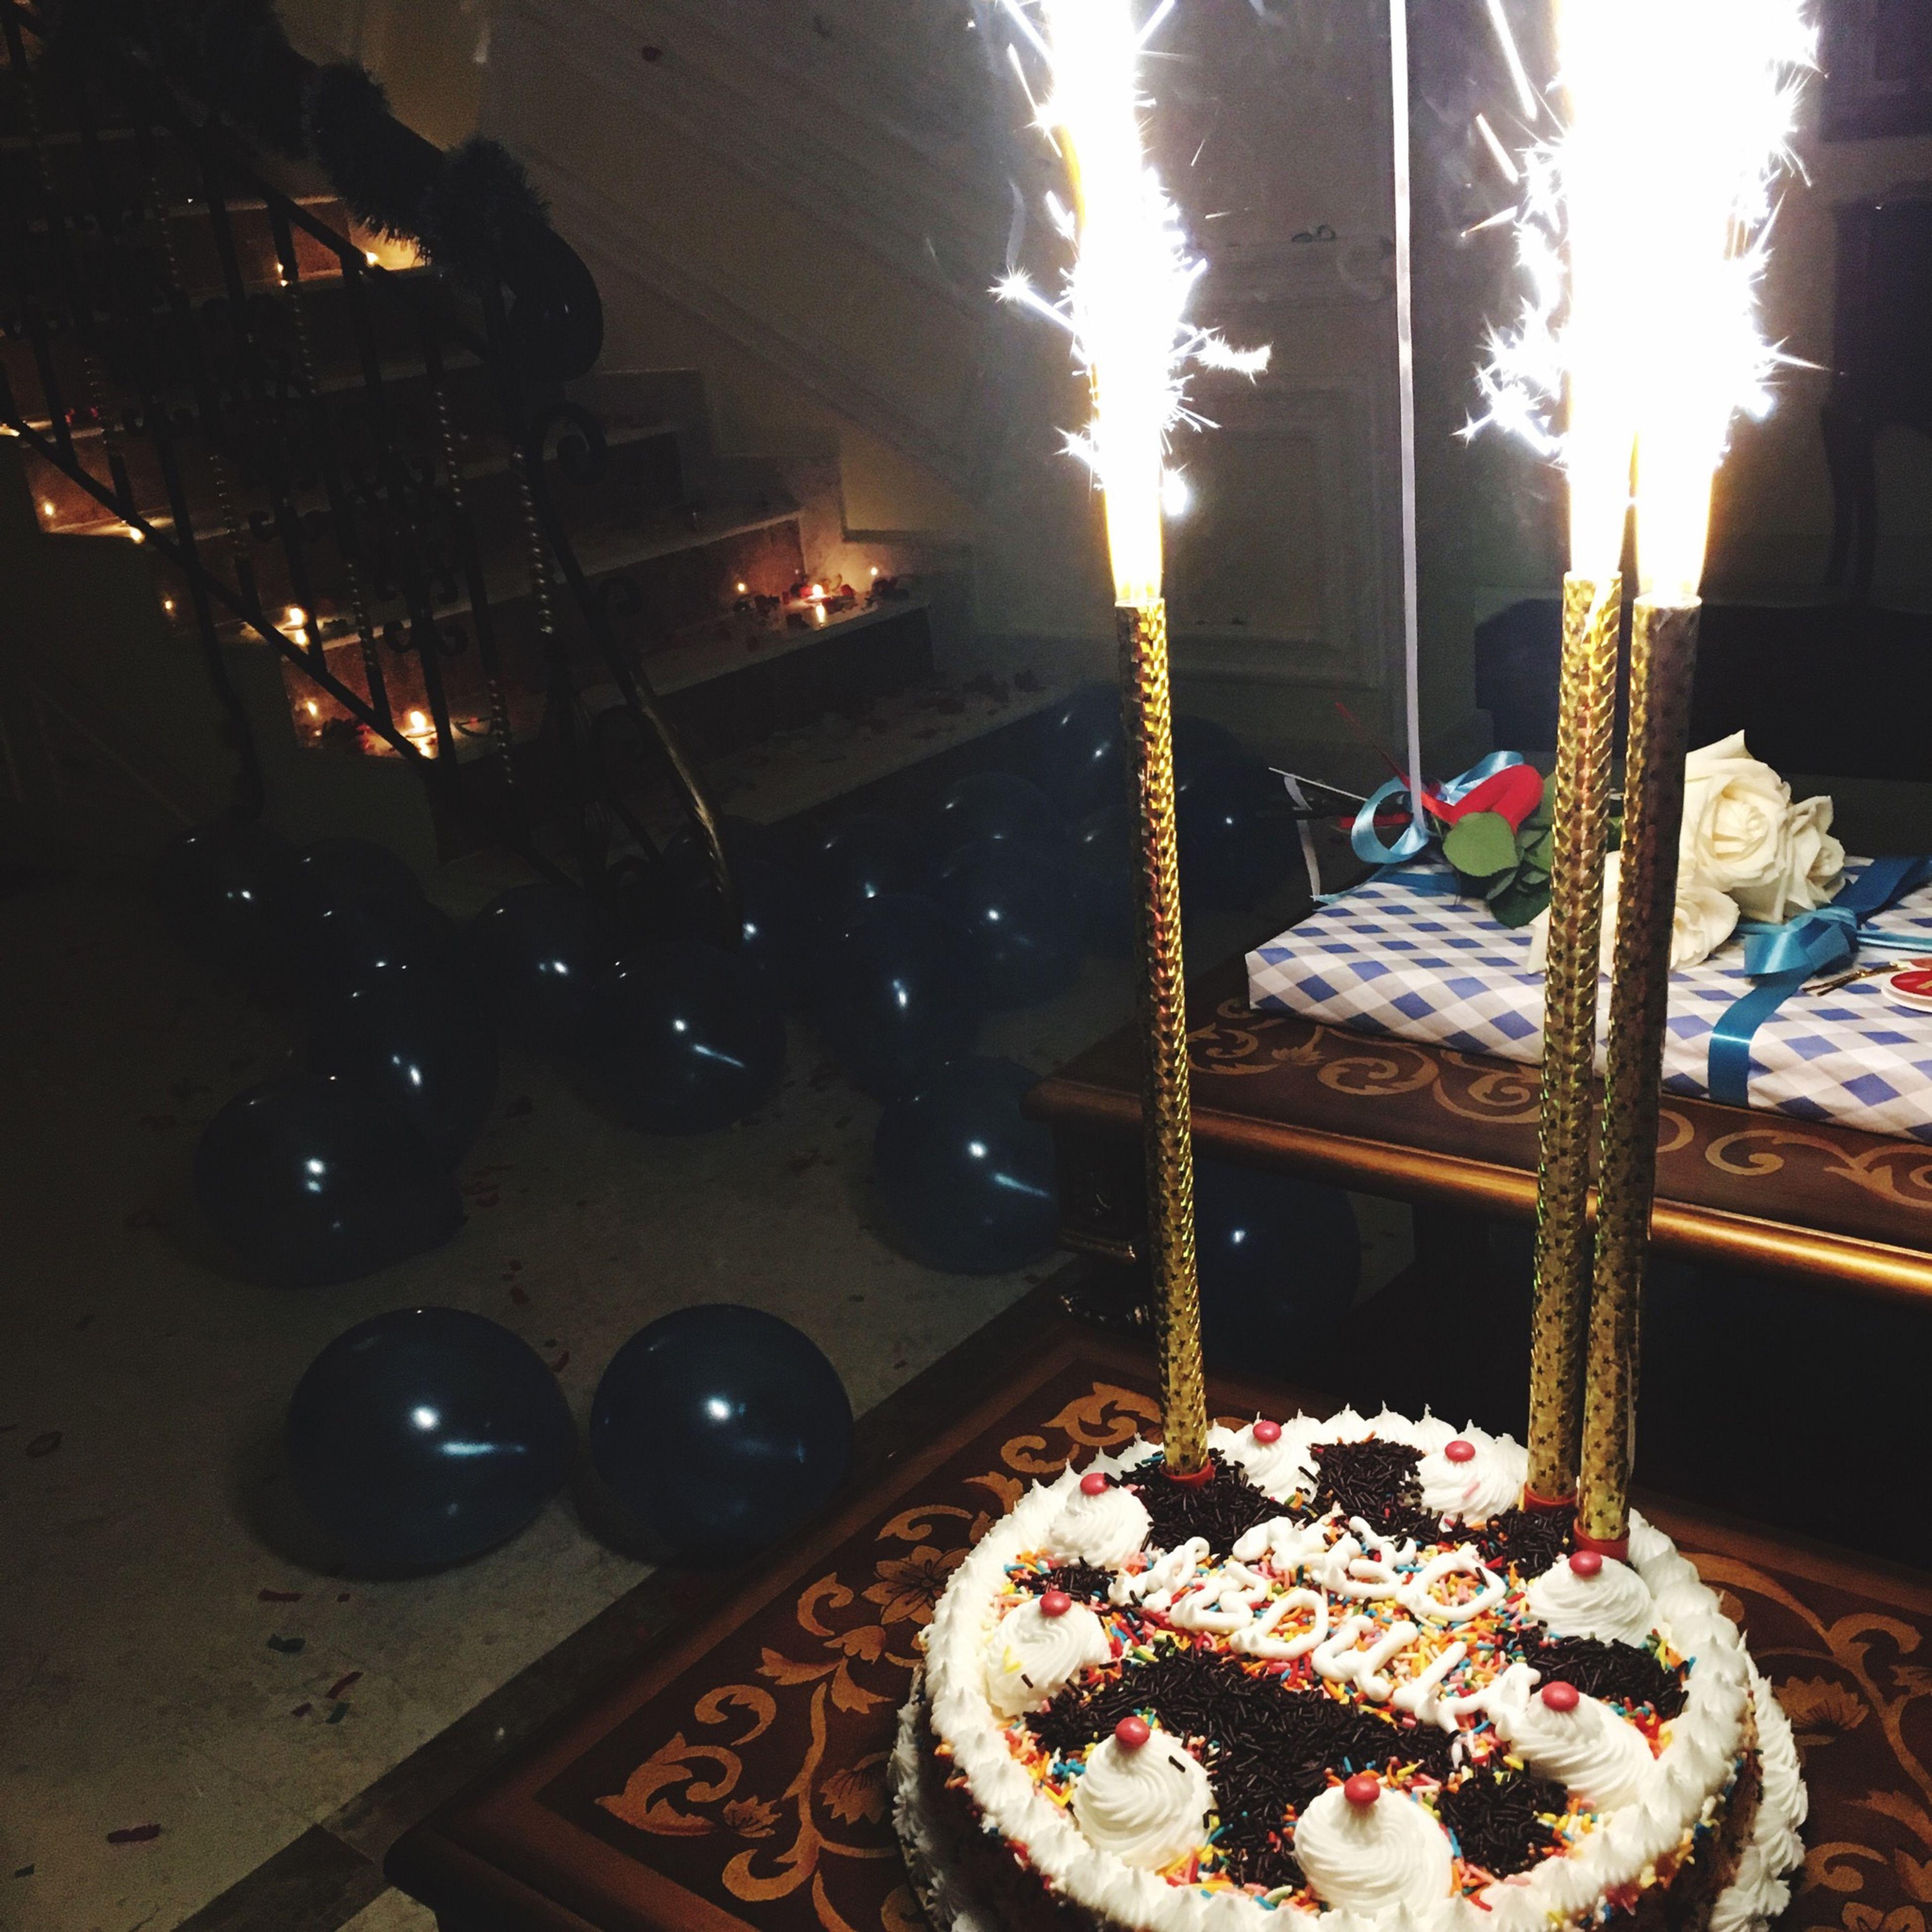 food, celebration, sweet food, decoration, food and drink, illuminated, dessert, tradition, large group of objects, christmas, unhealthy eating, abundance, still life, freshness, indulgence, burning, variation, flame, no people, indoors